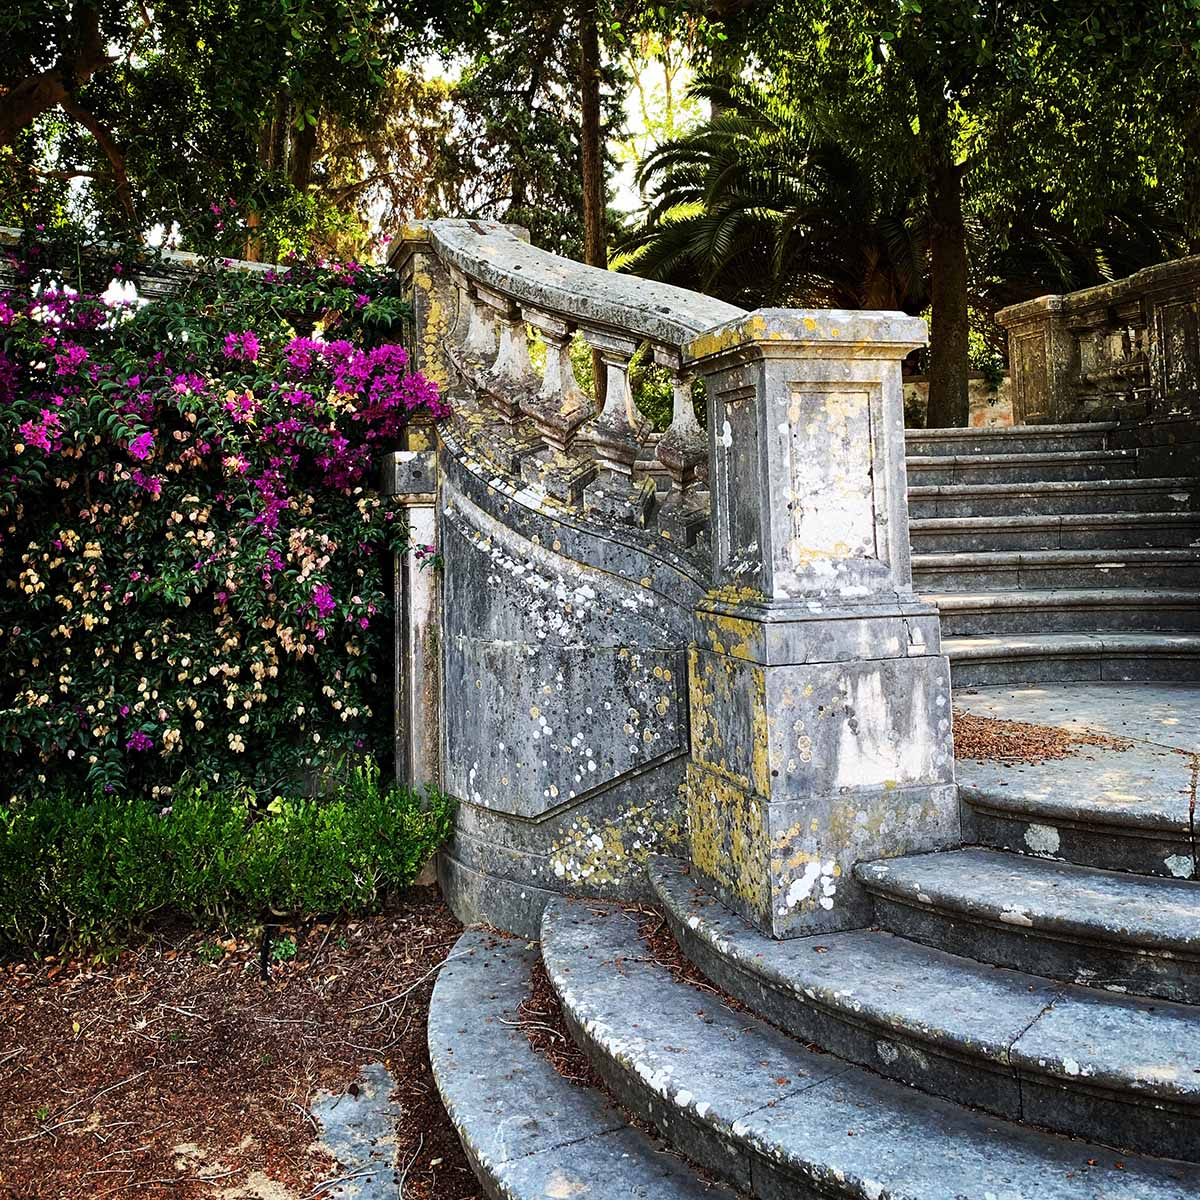 Jardim Botanico da Ajuda stairwell in Belem